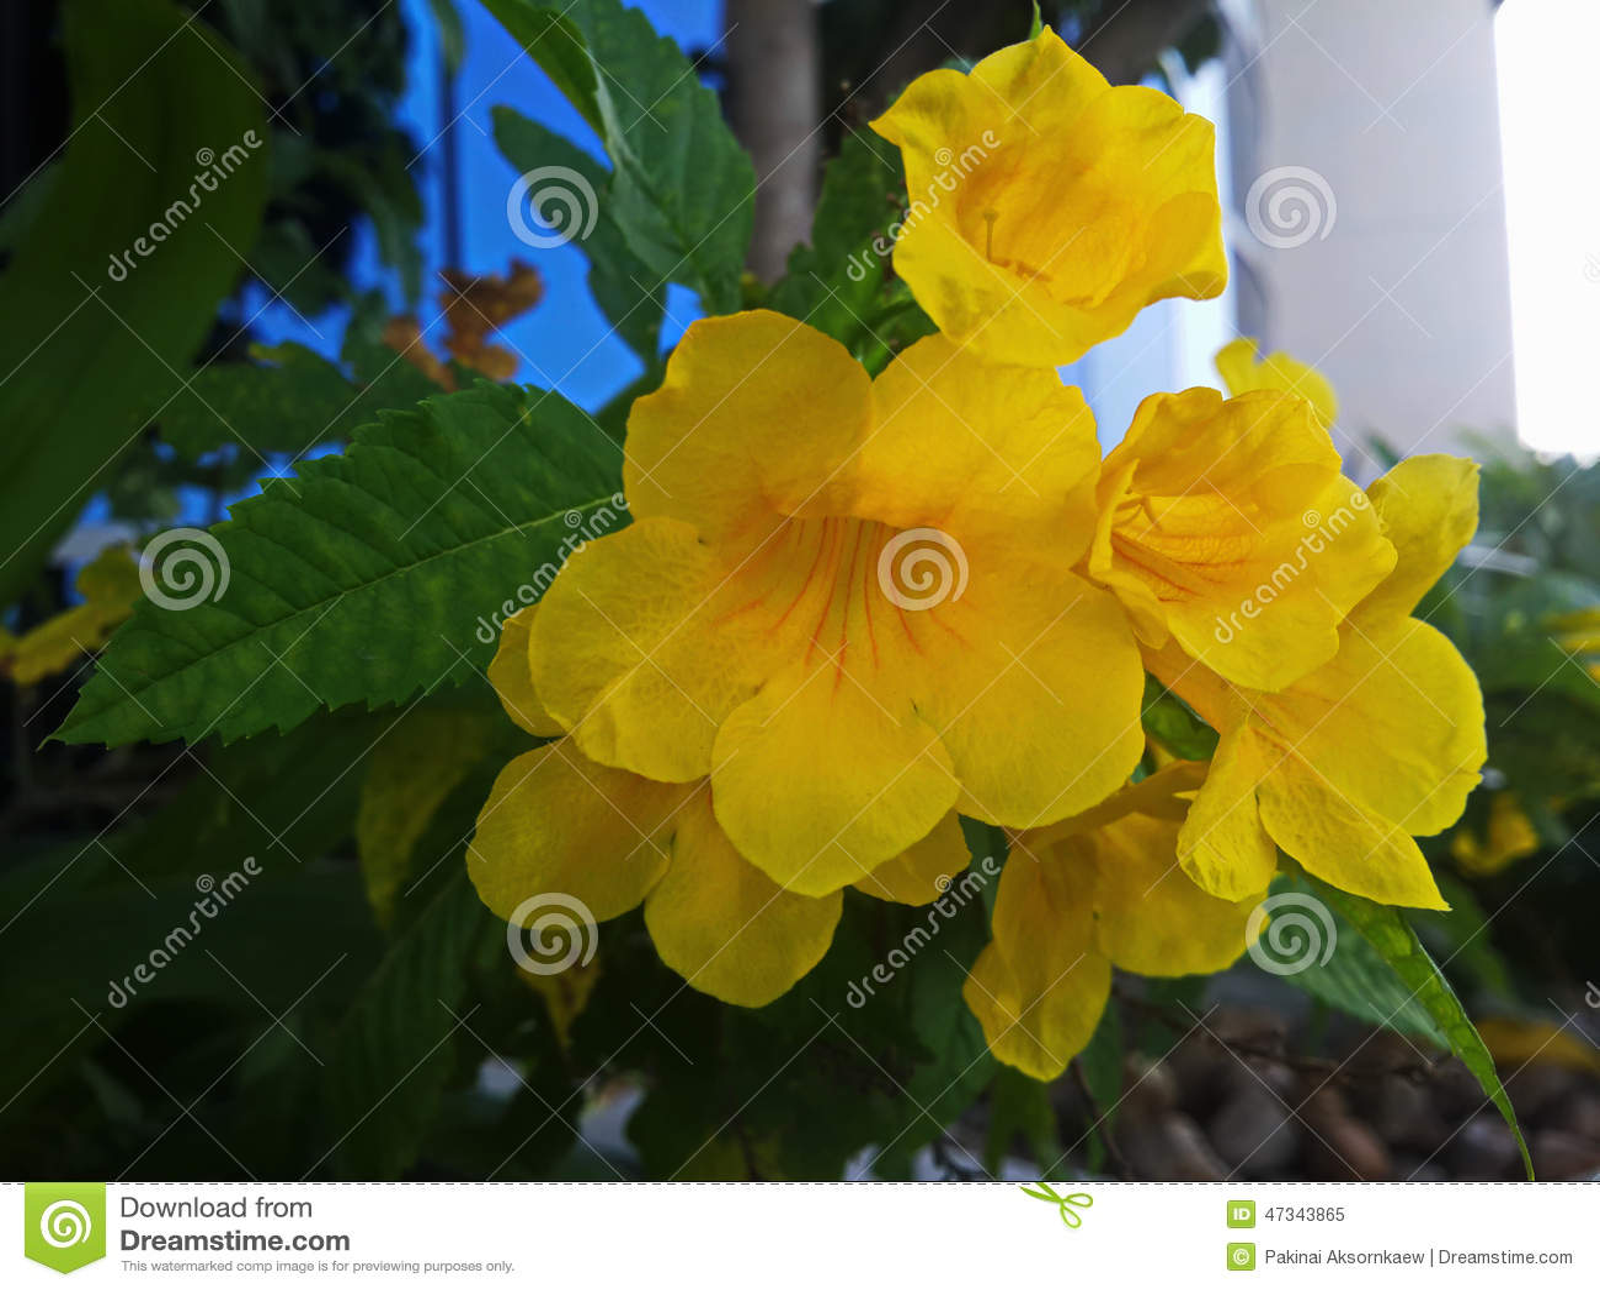 Yellow Rare Wild Flowers Stock Image Image Of Make Ever 47343865